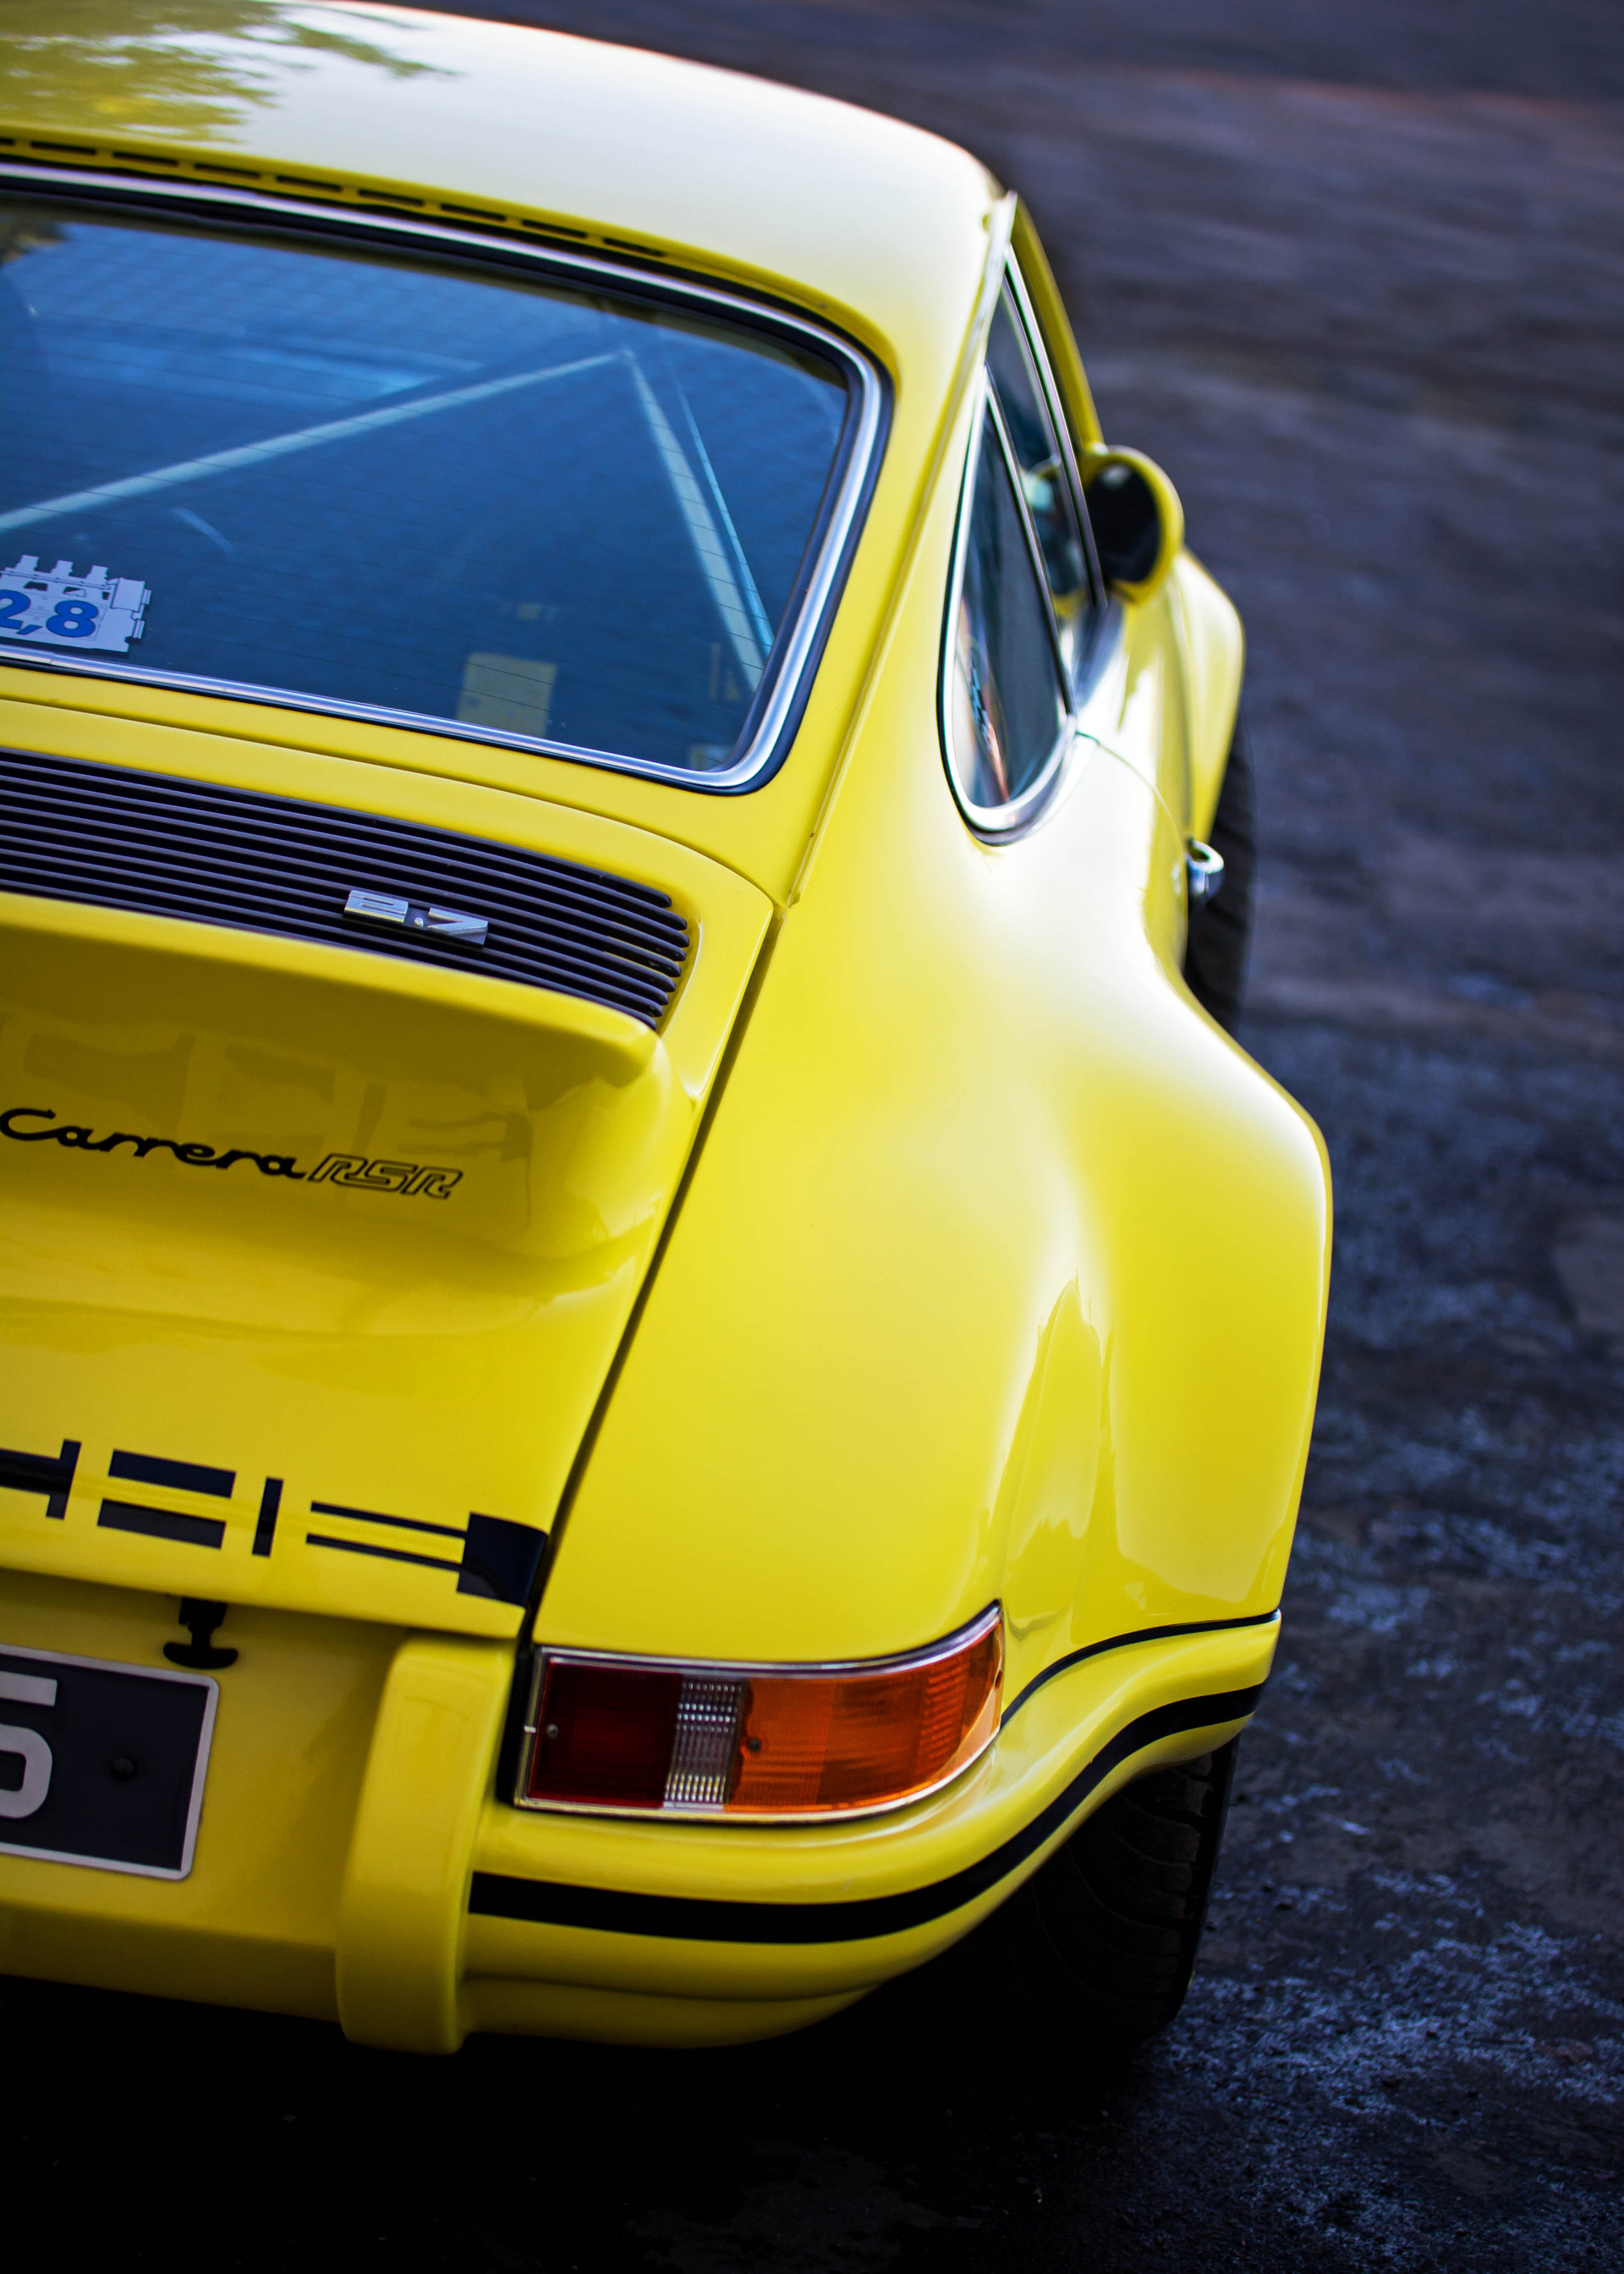 Porsche 911 Carrera 2.7 RSR